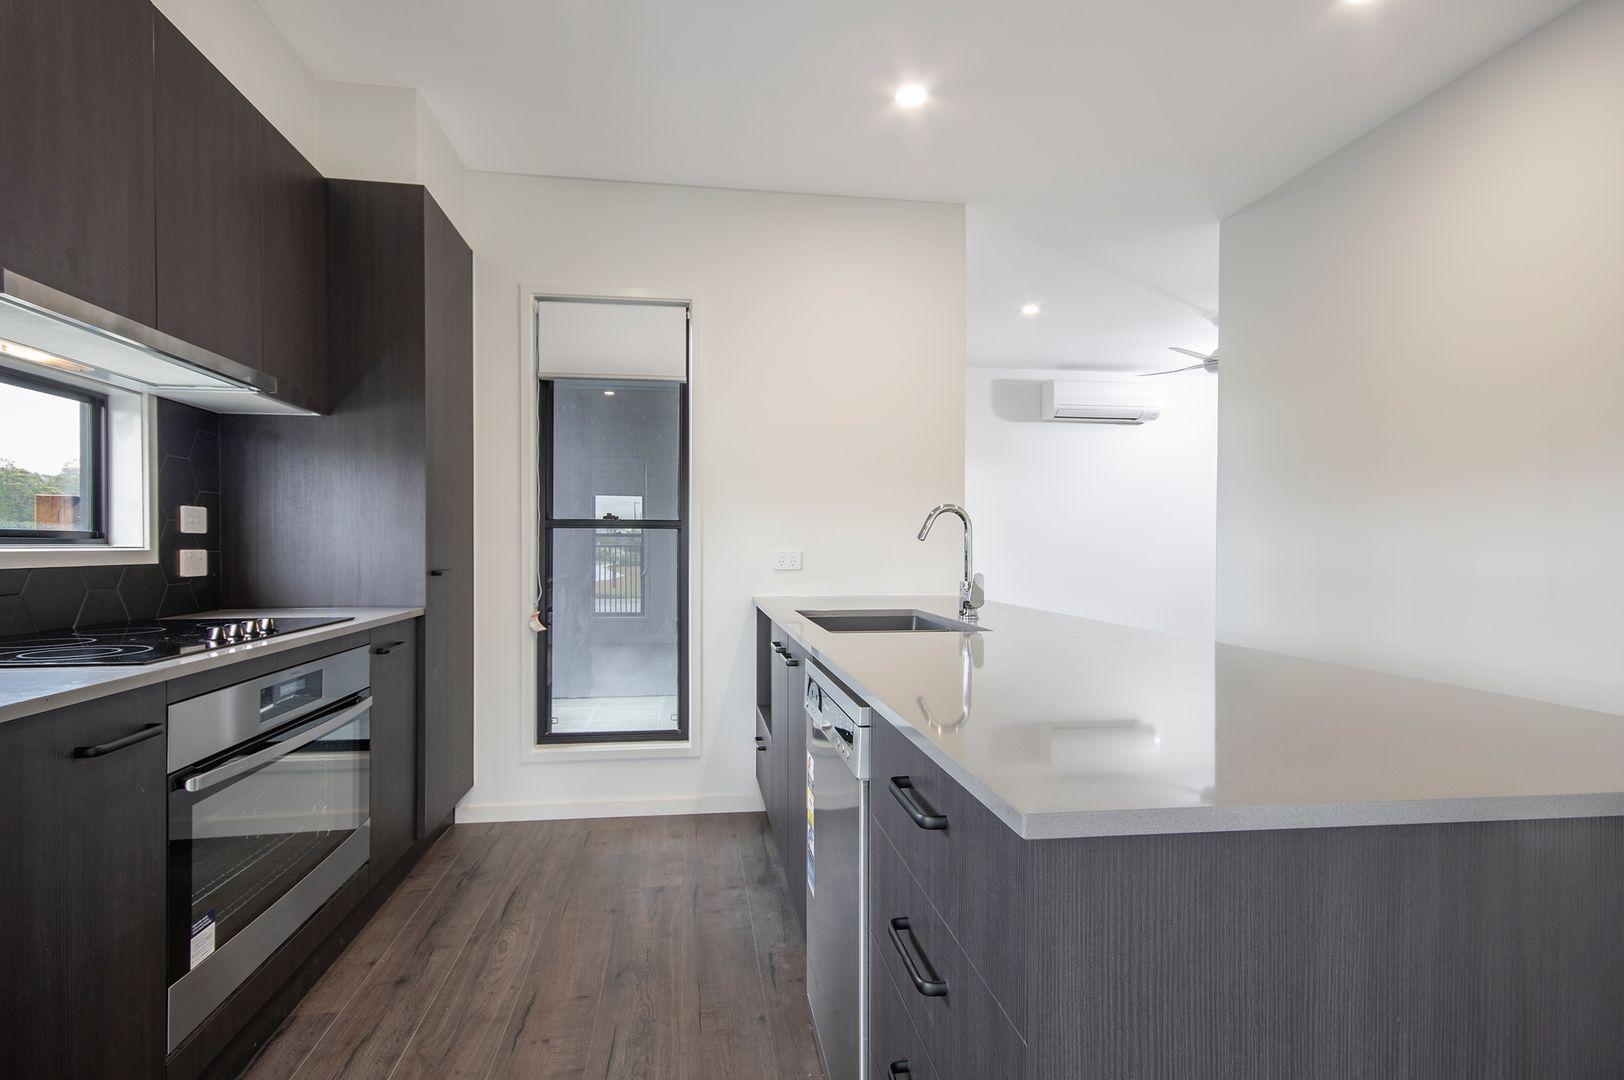 Lot 1578 Harry street, Aura,, Caloundra West QLD 4551, Image 0